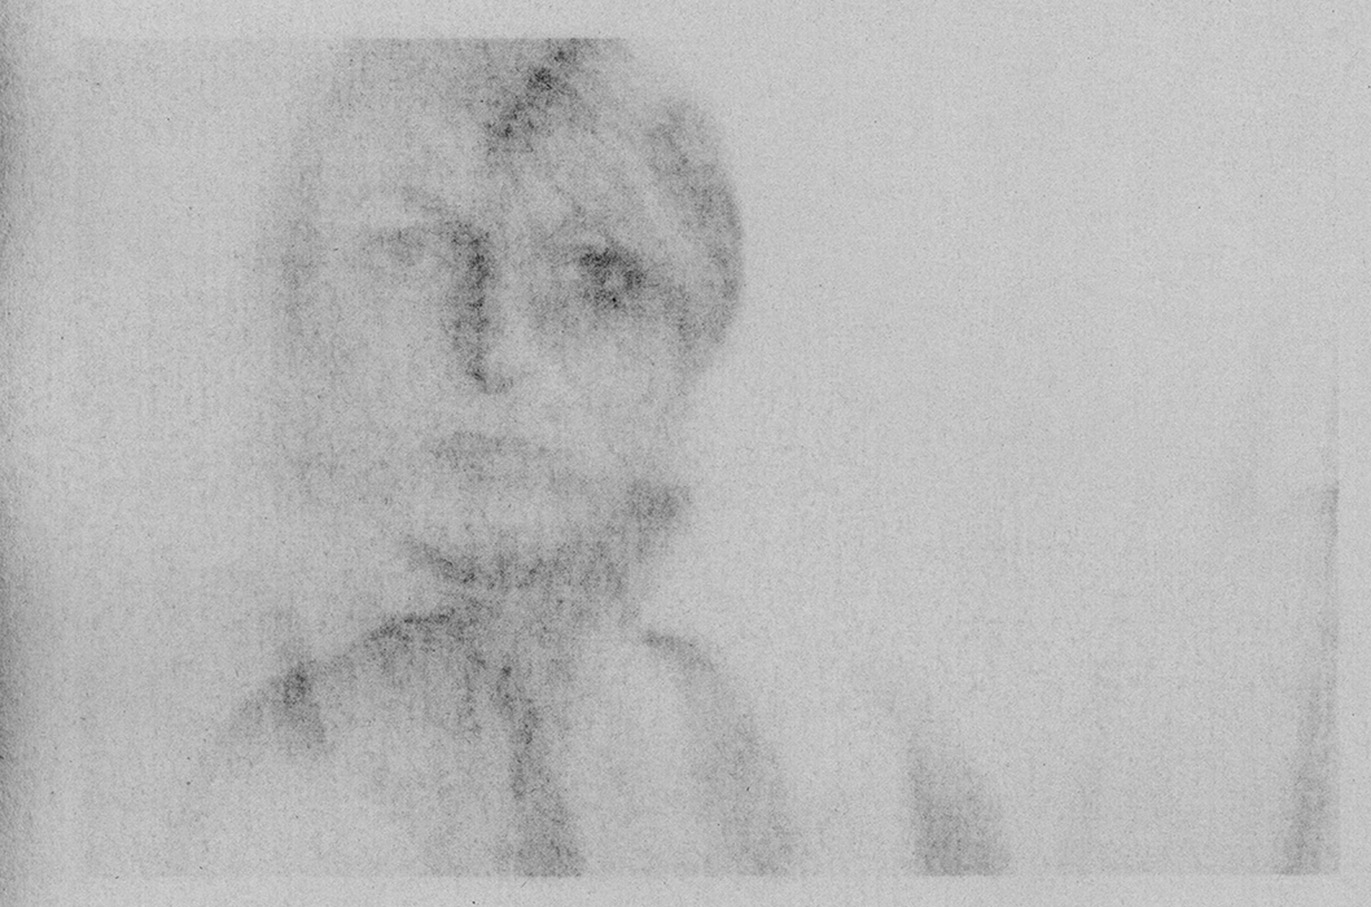 Paper-Portrait-Elisa-Migda-La nuit remue